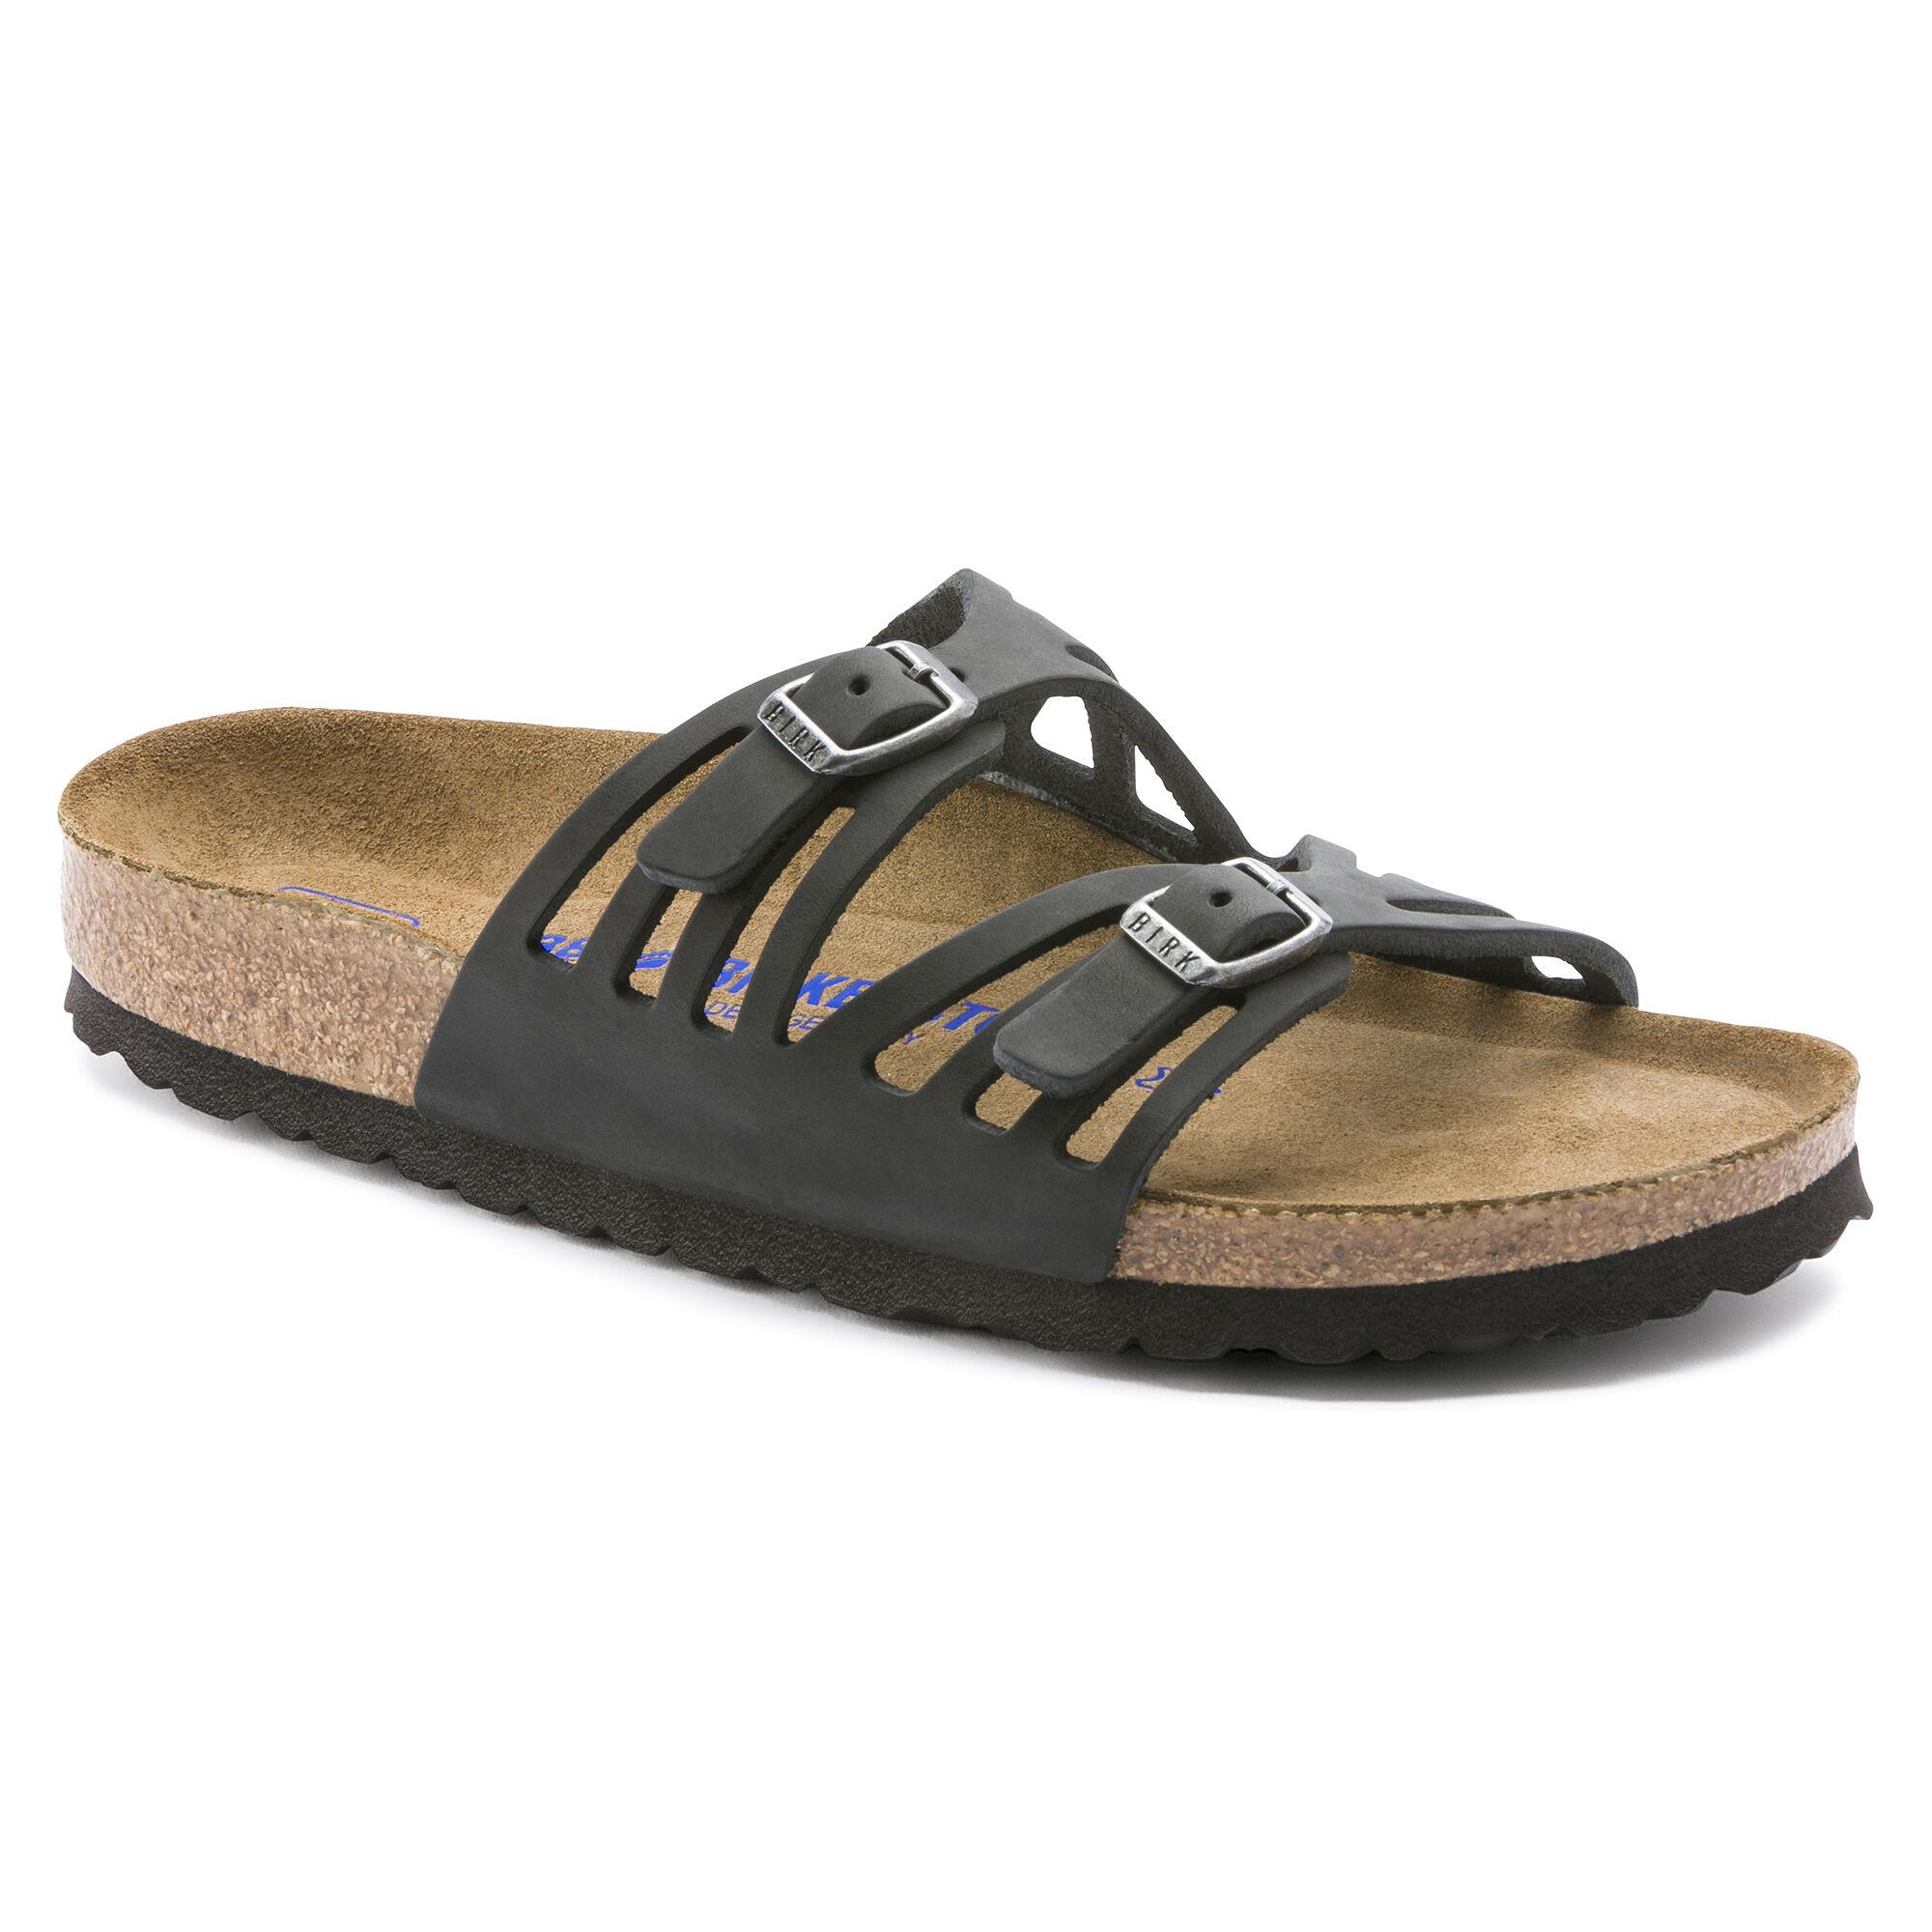 Birkenstock Zapatos Destalonados Arizona Star WarsBirko-Flor®Topo Claro Y Negro KJH7dARI6